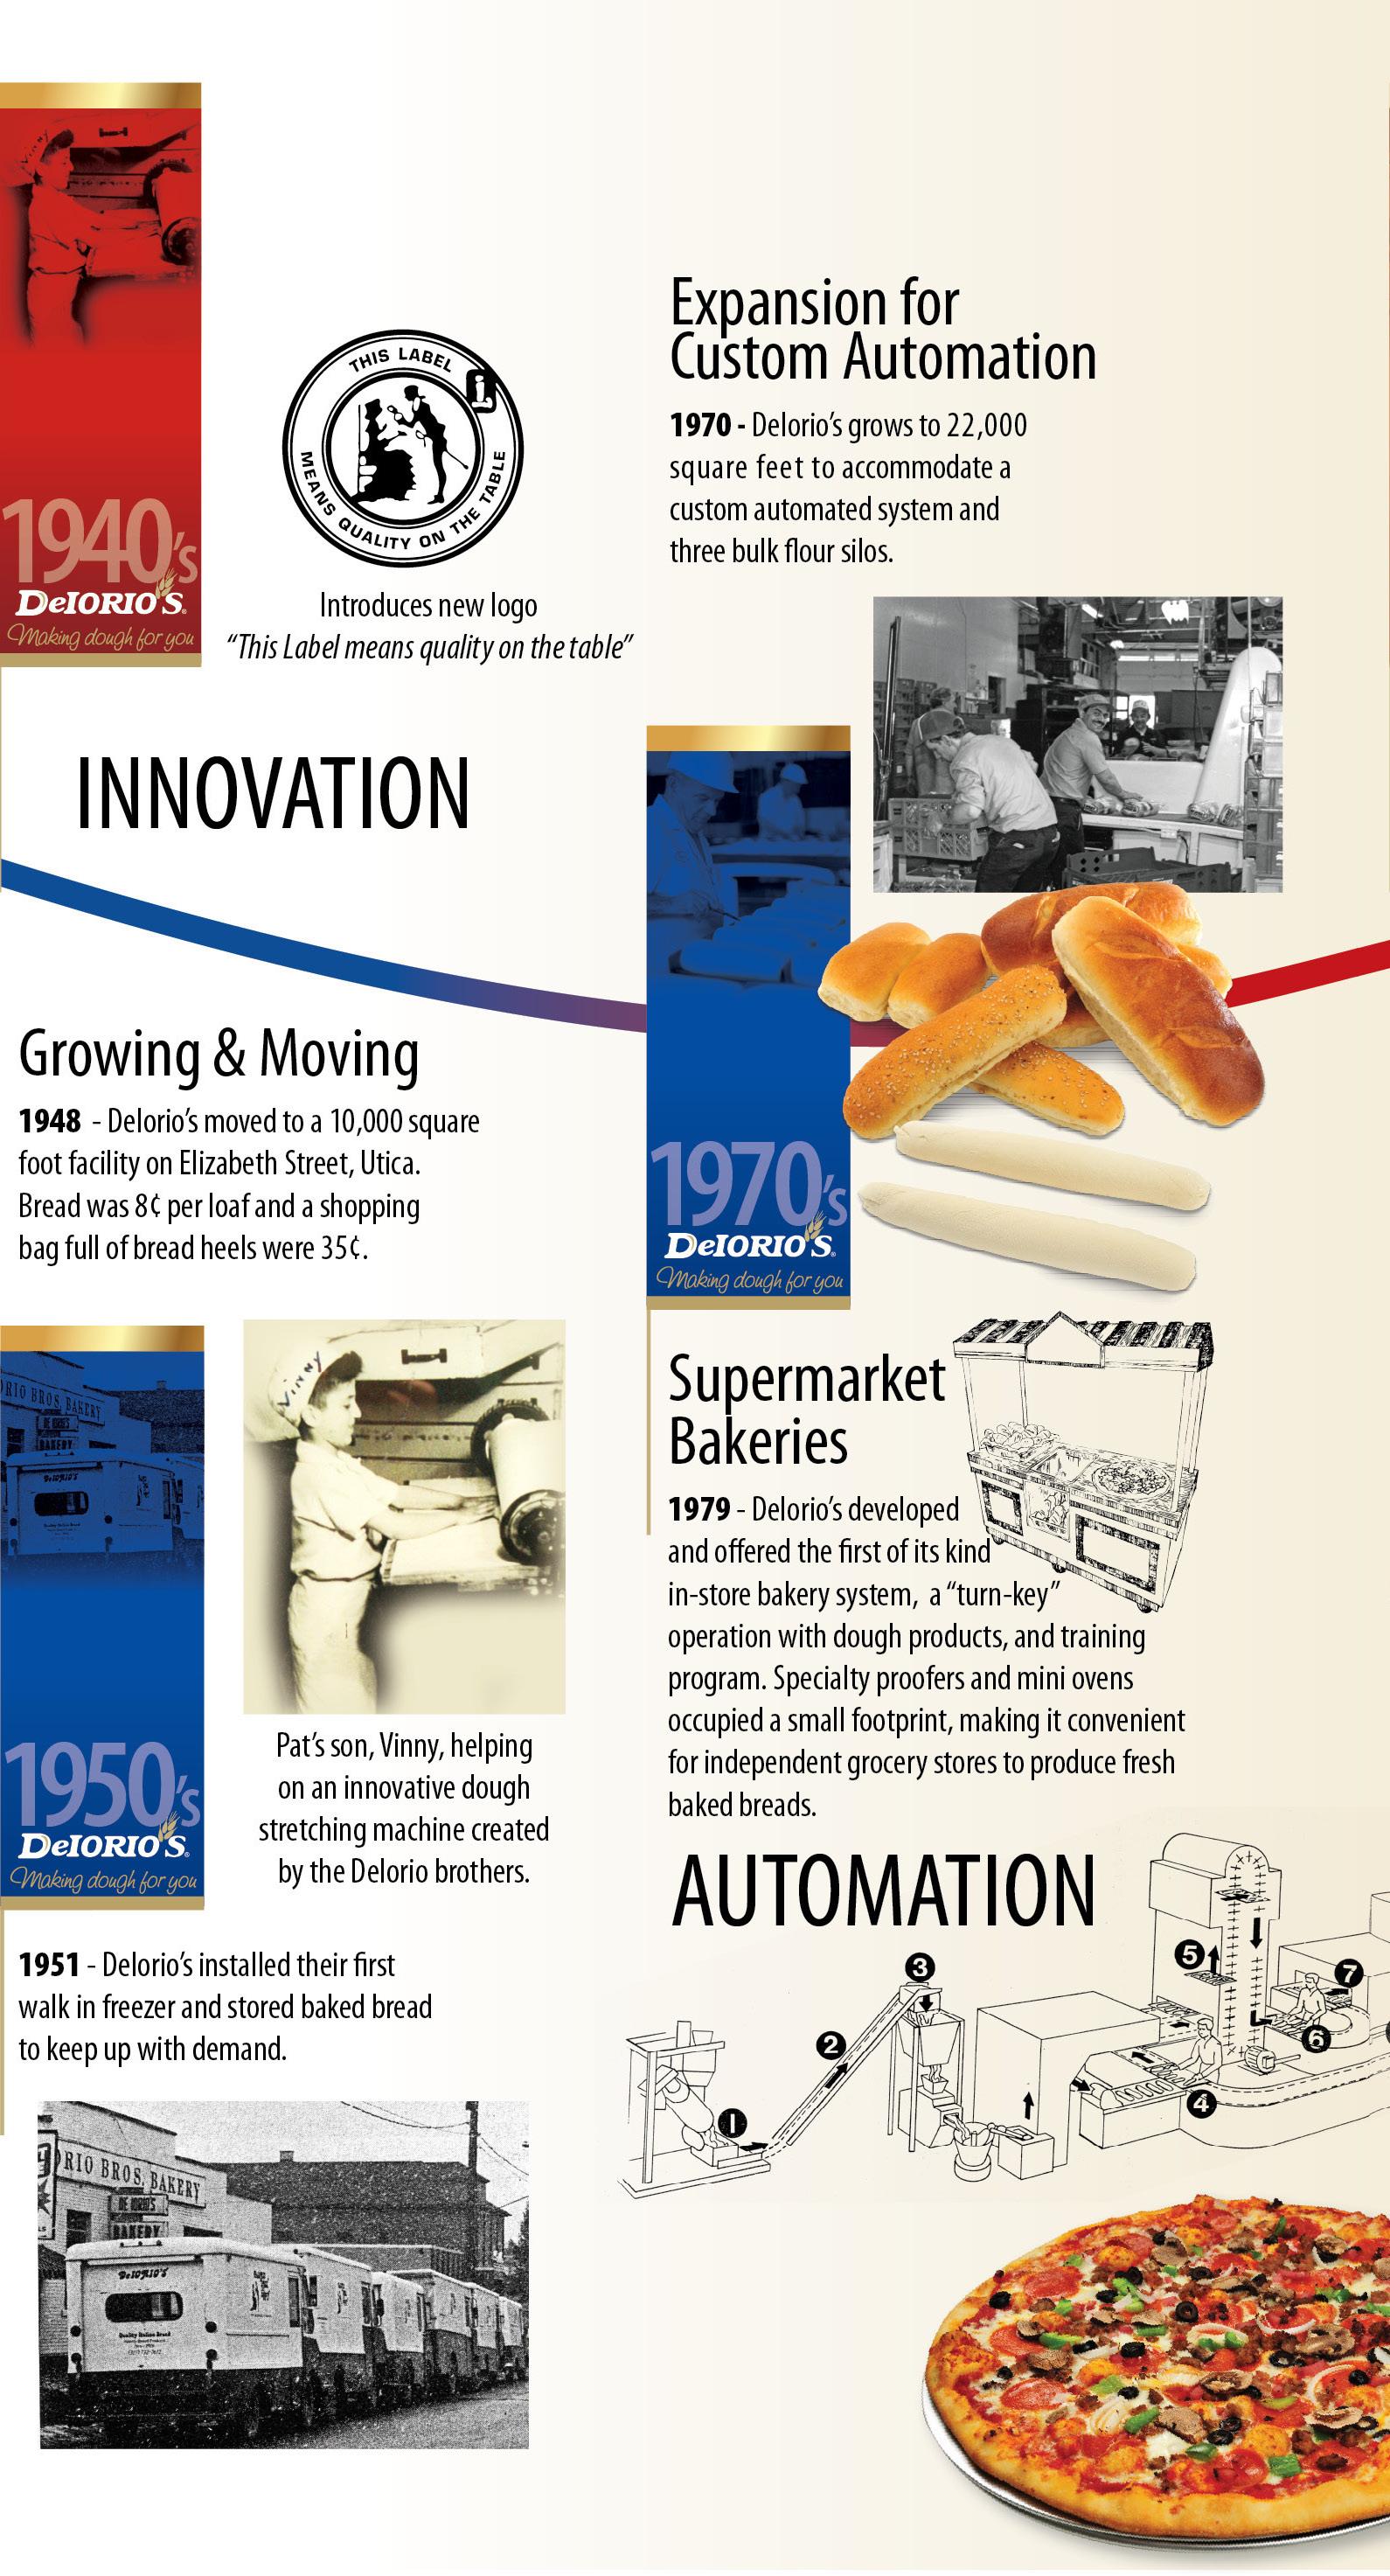 Deiorios history 1940-70s